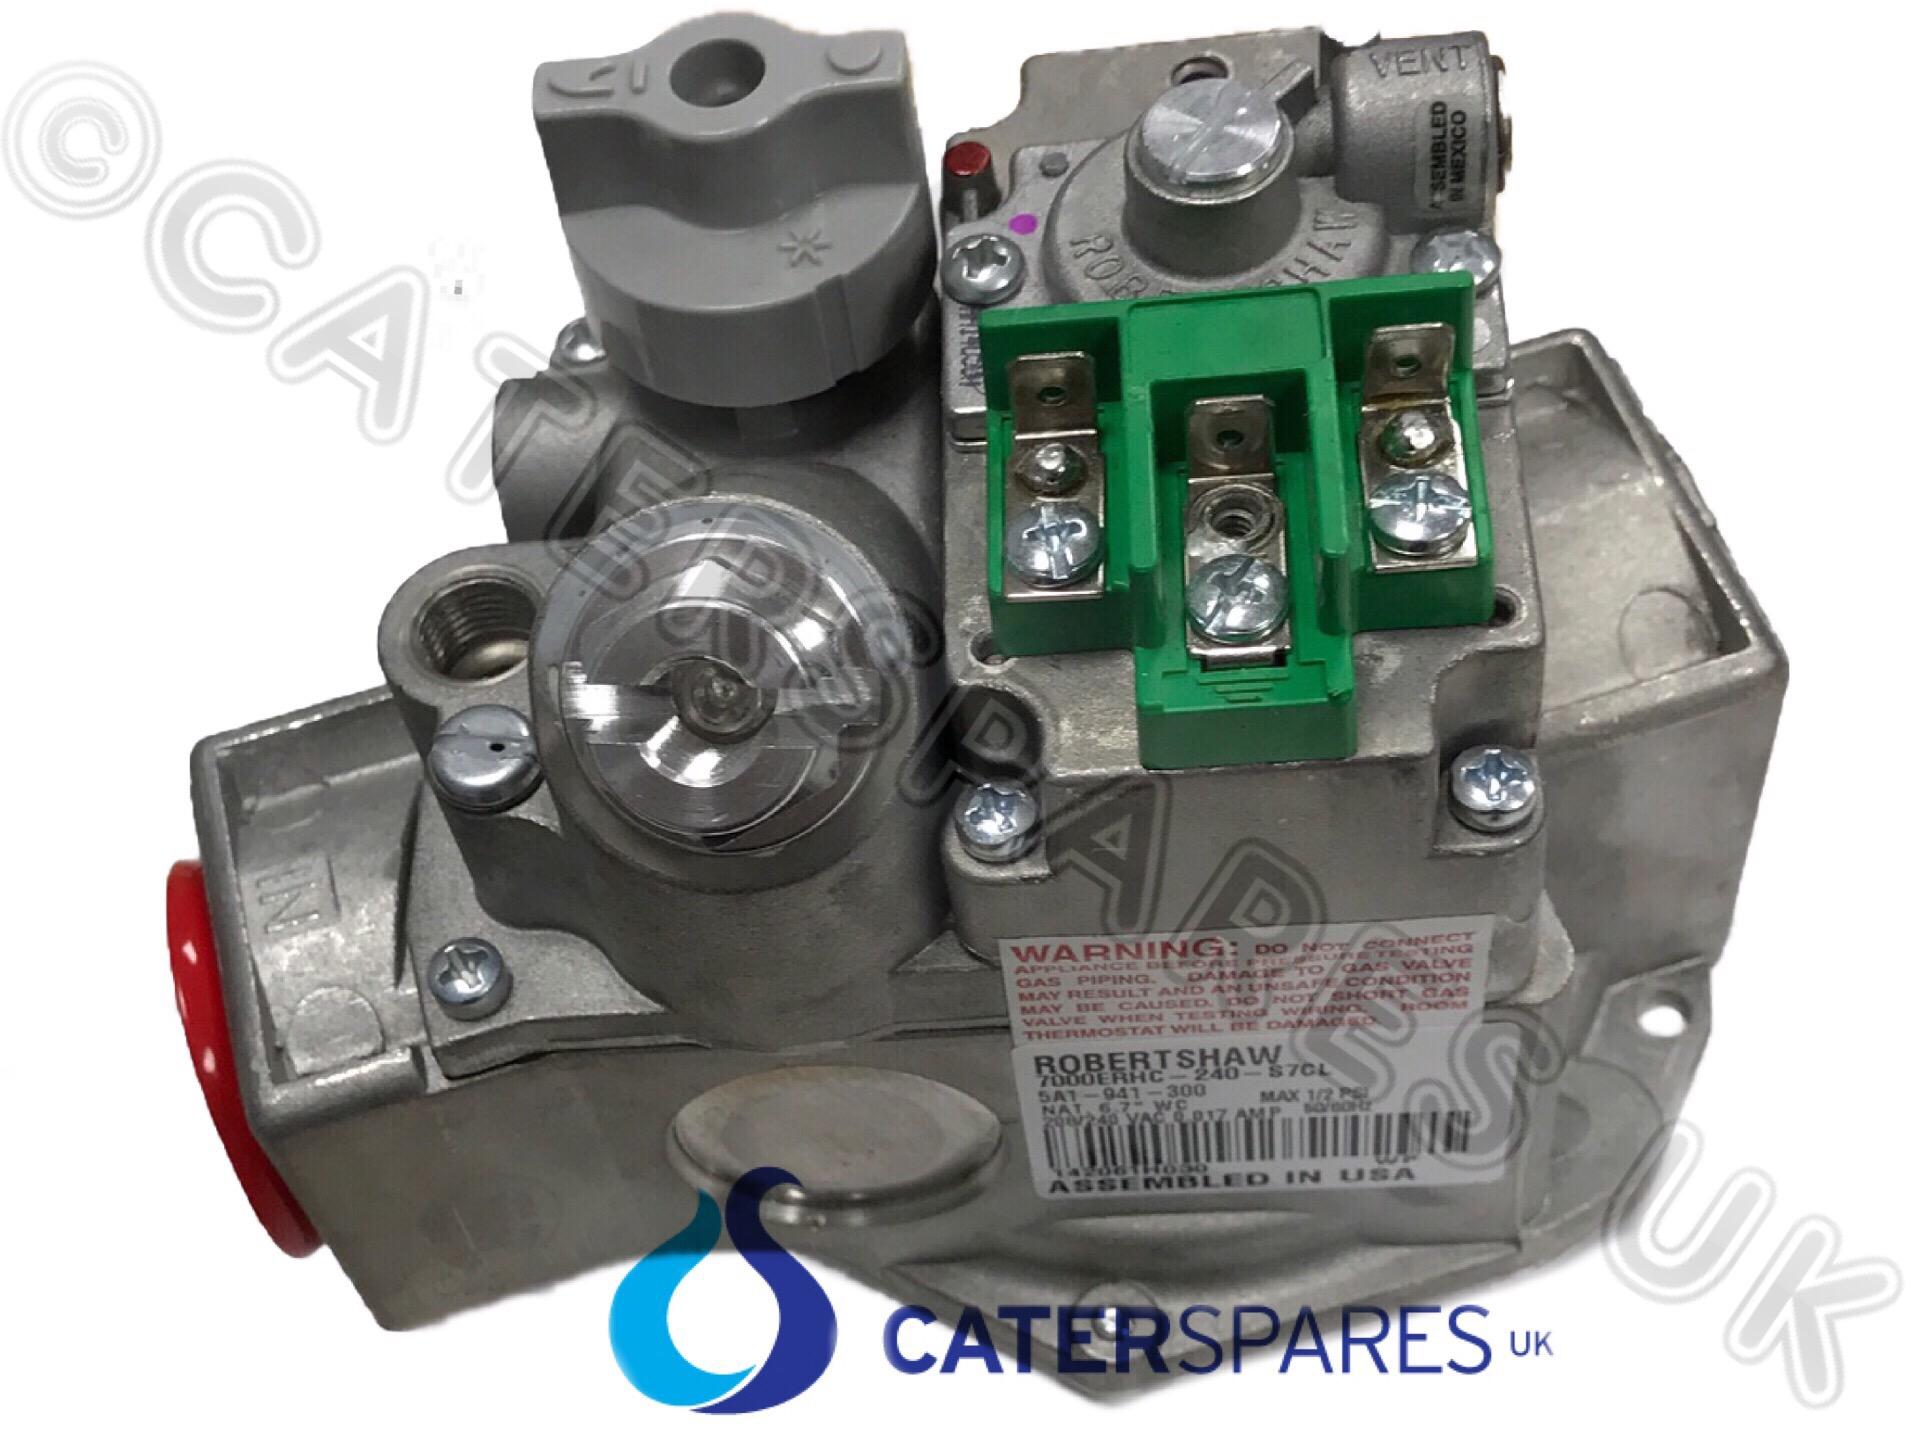 Modine Heater Replacement Robertshaw Gas Control Valve